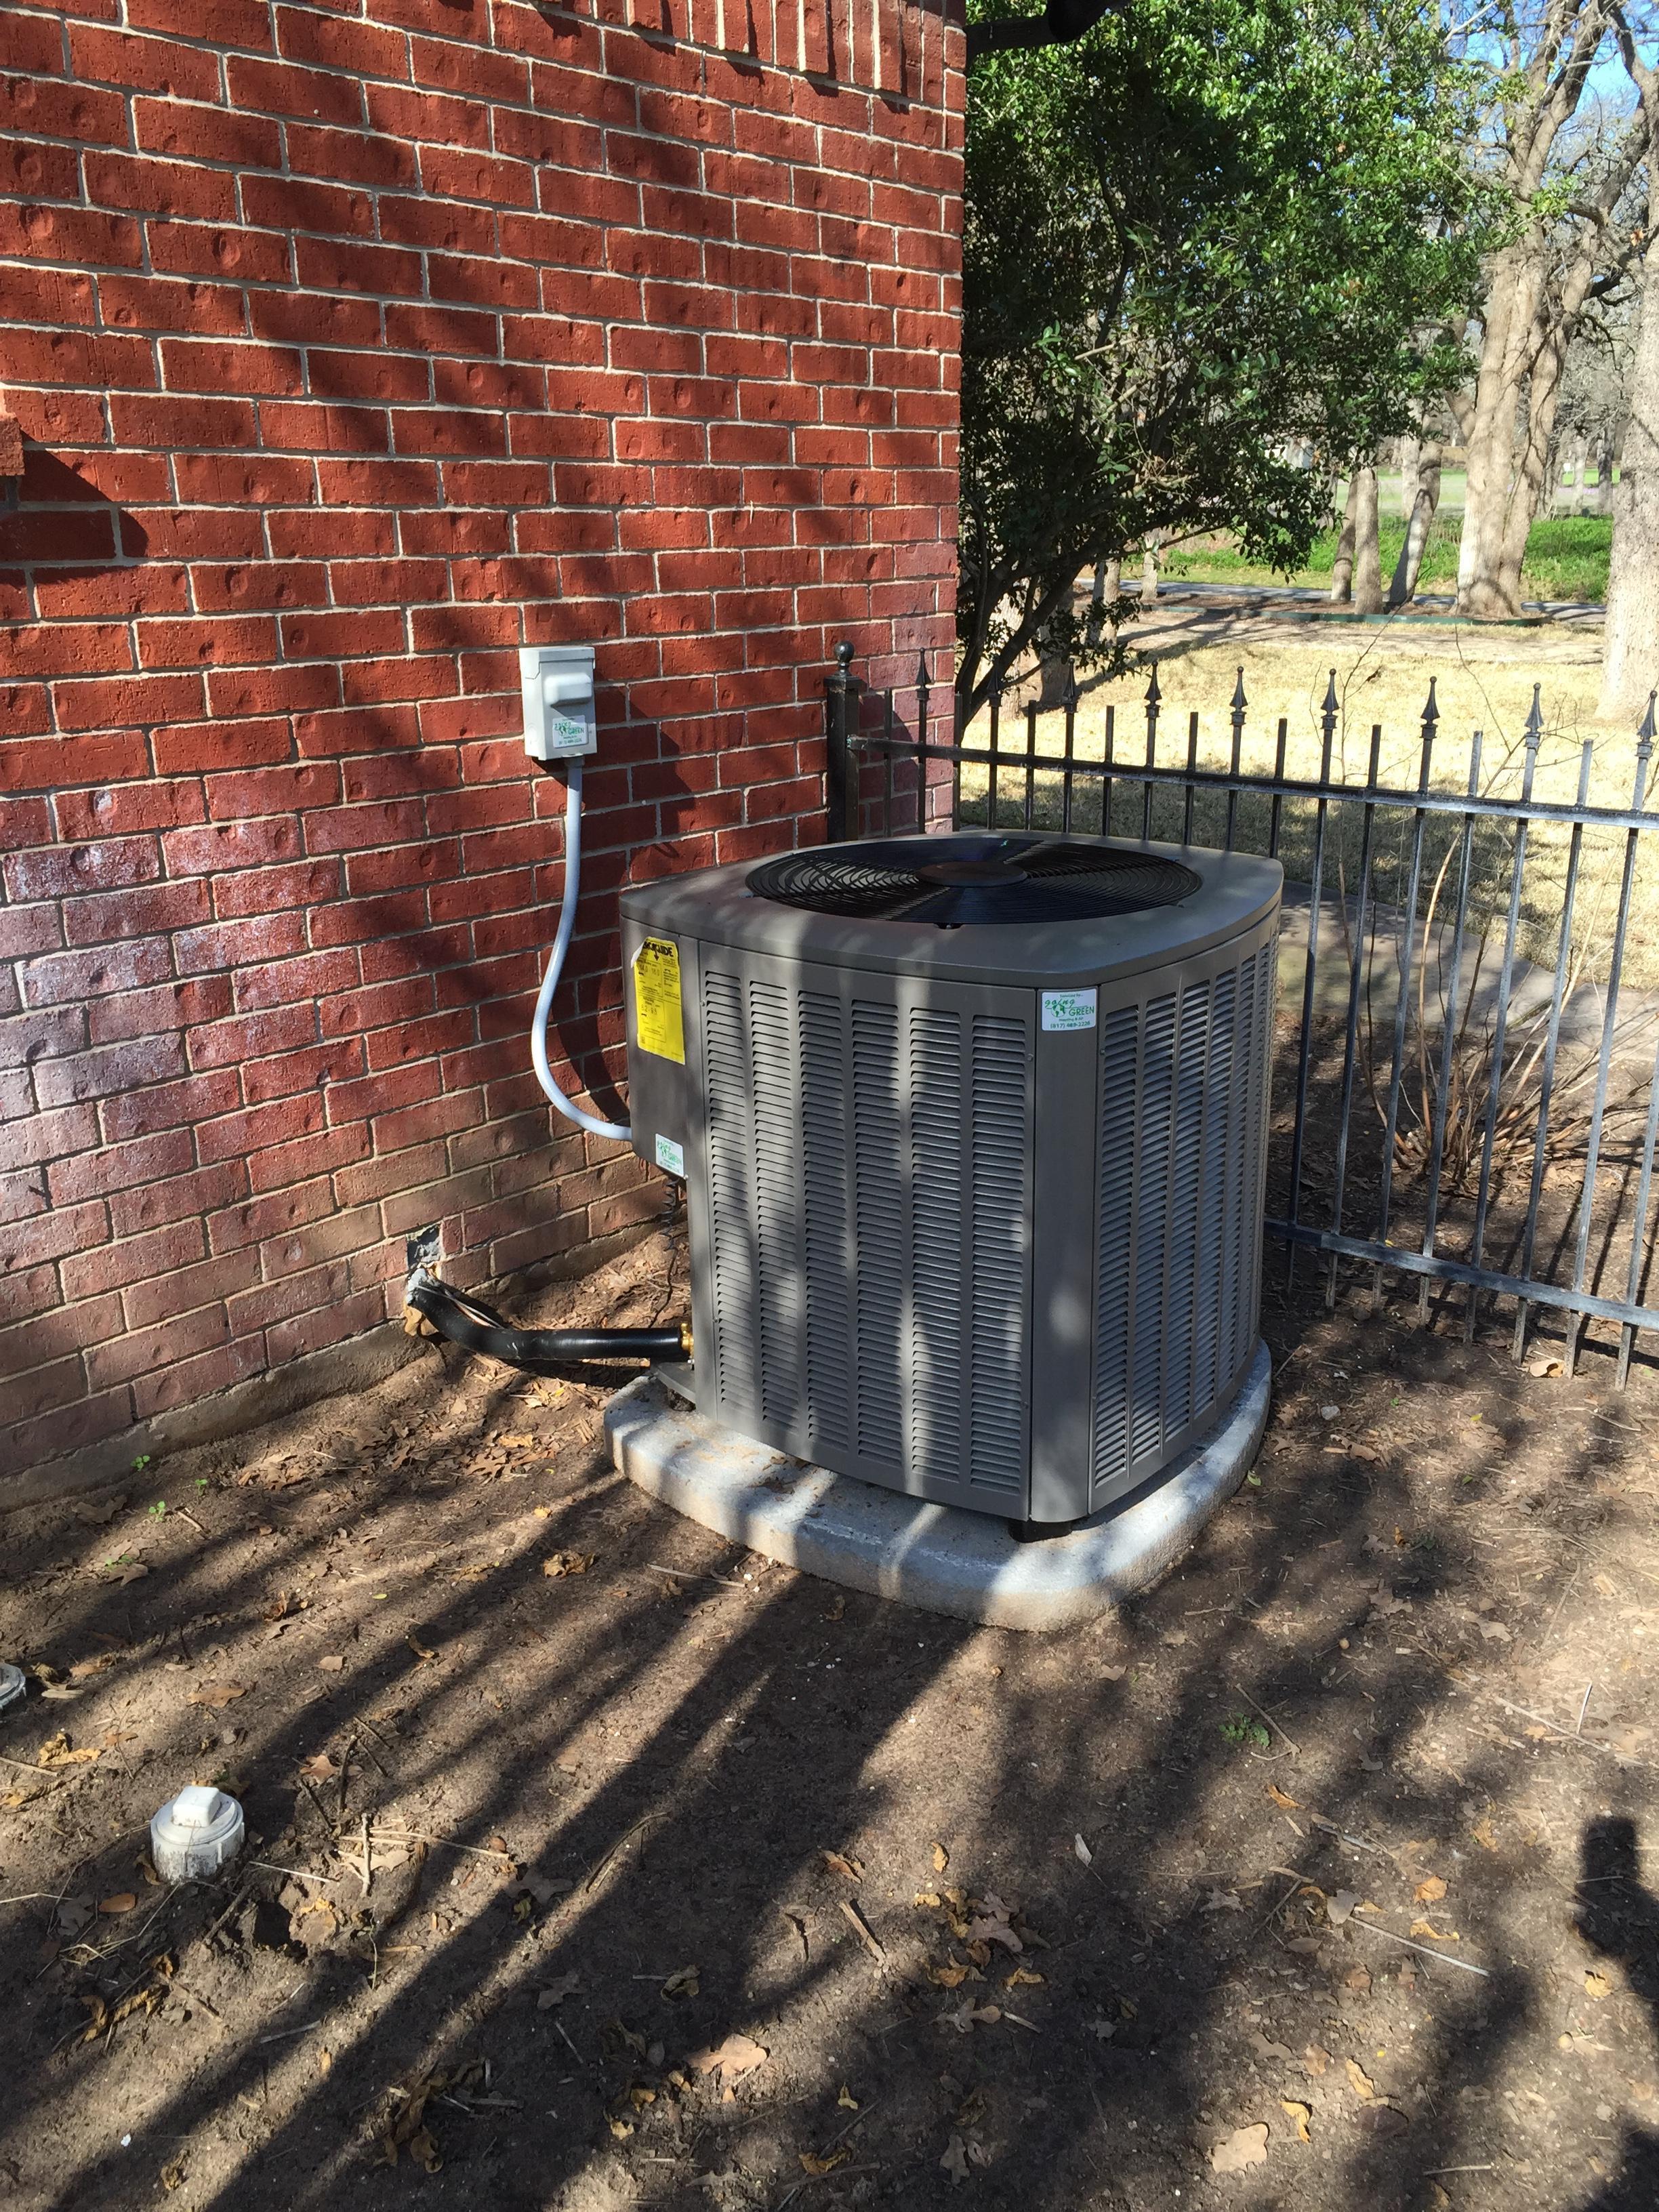 New 16seer heat pump installed this summer